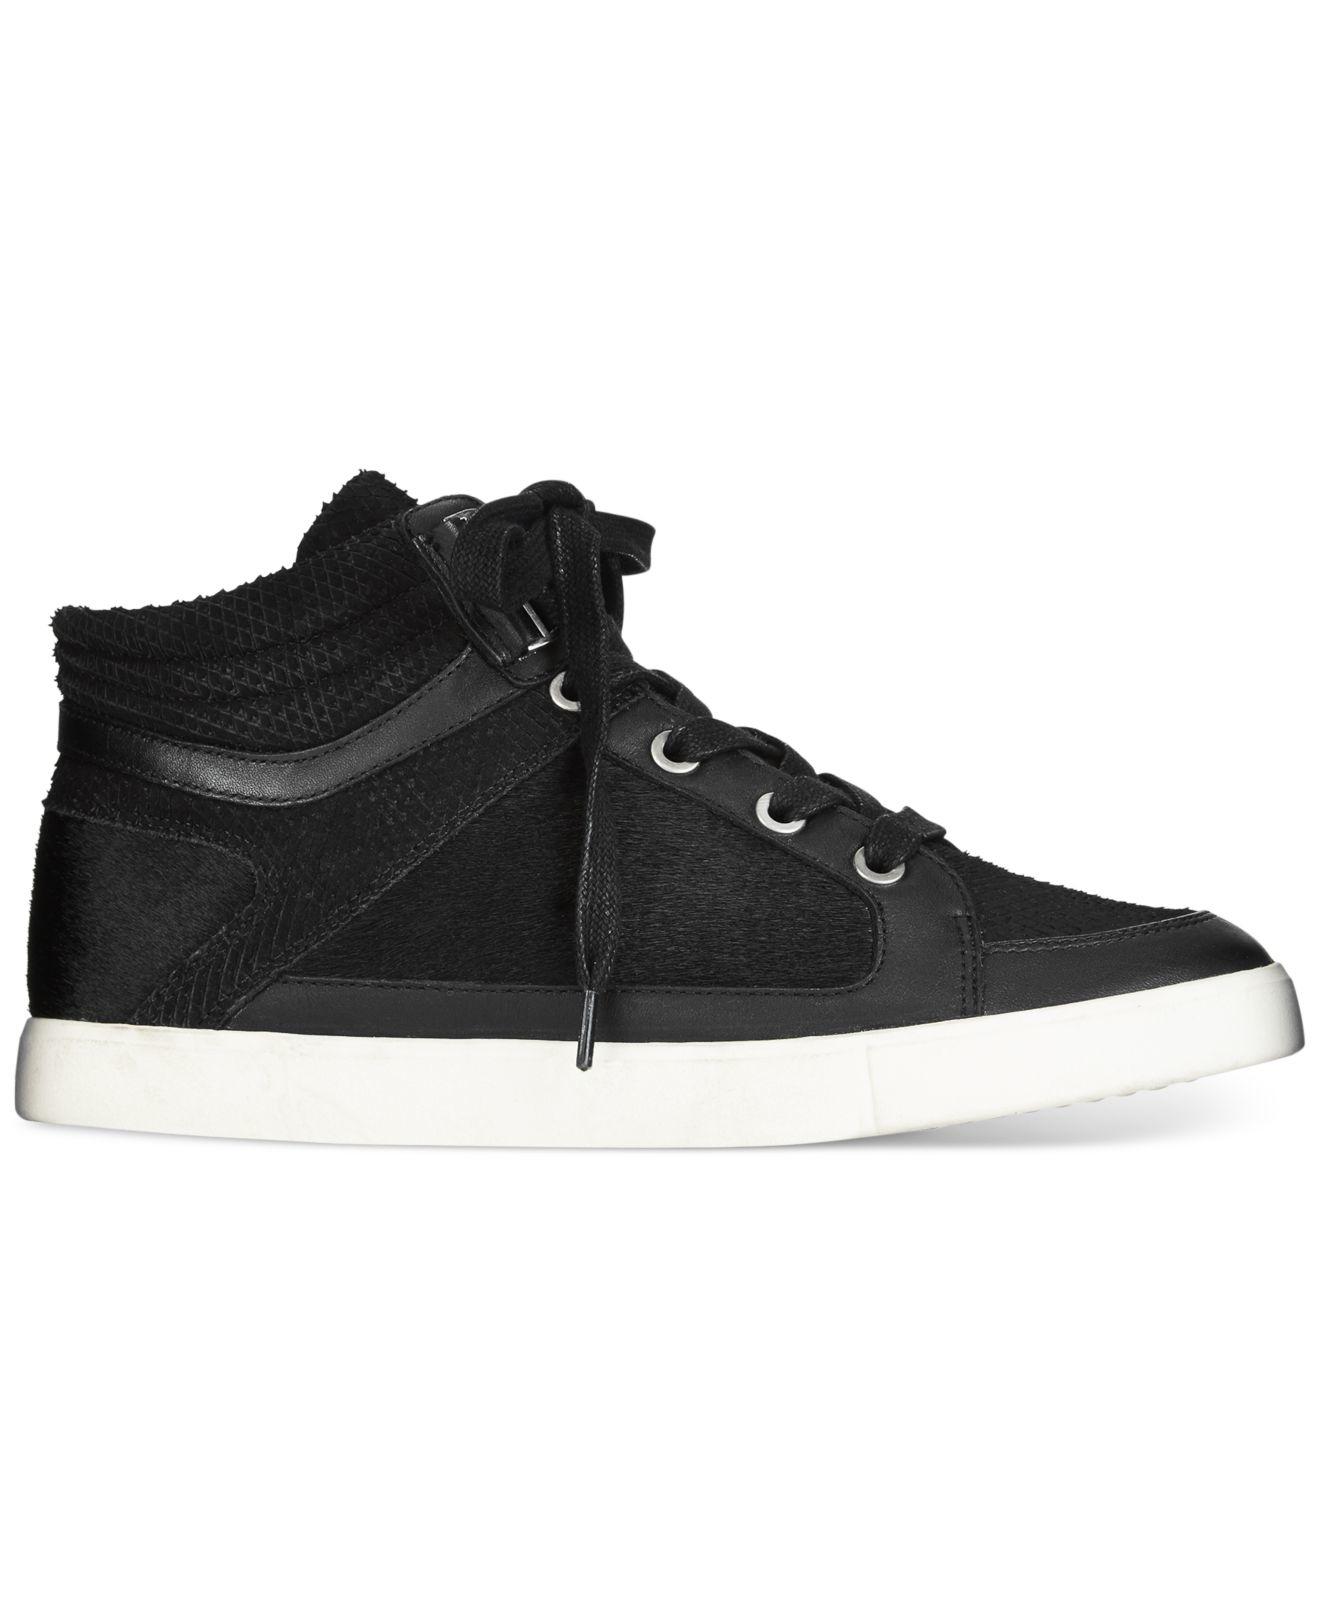 calvin klein lyda high top sneakers in black lyst. Black Bedroom Furniture Sets. Home Design Ideas